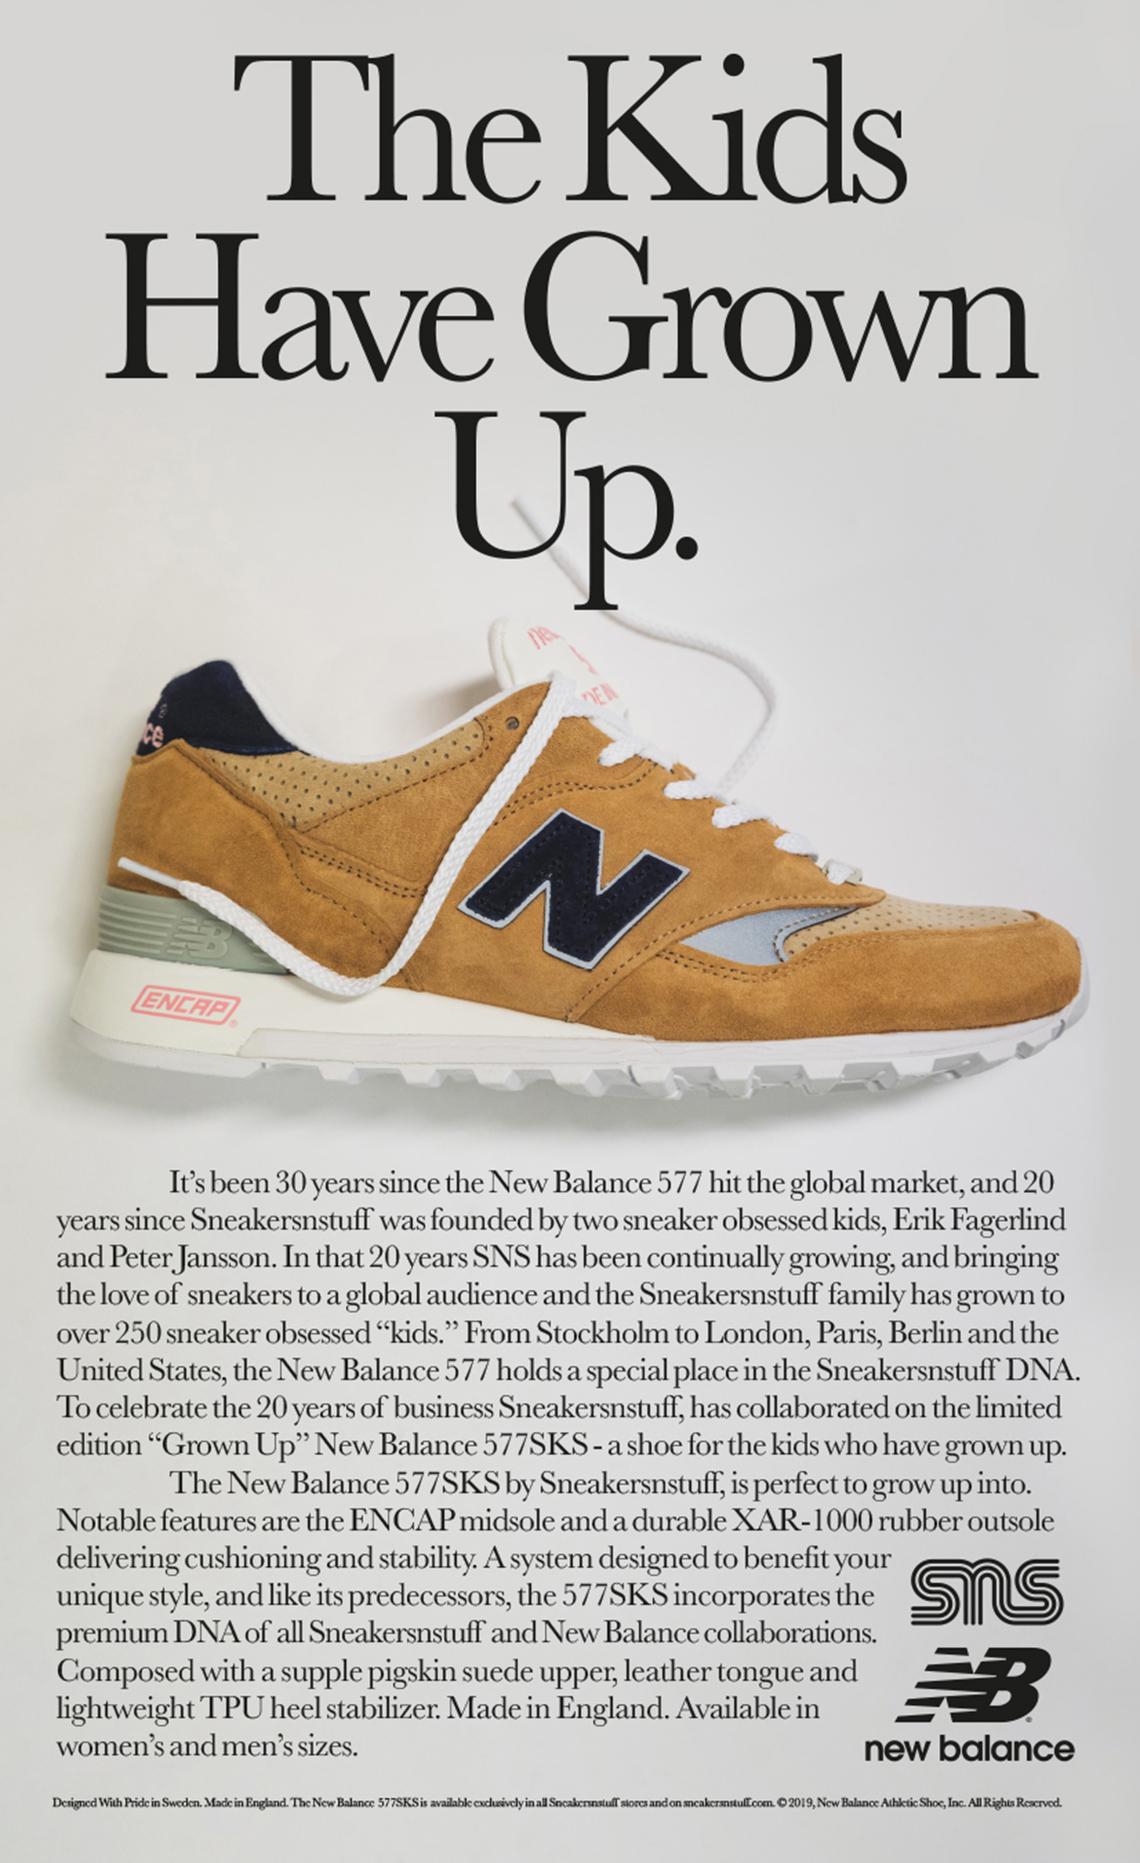 c70b6f3543 Sneakersnstuff New Balance 577 Release Date | SneakerNews.com